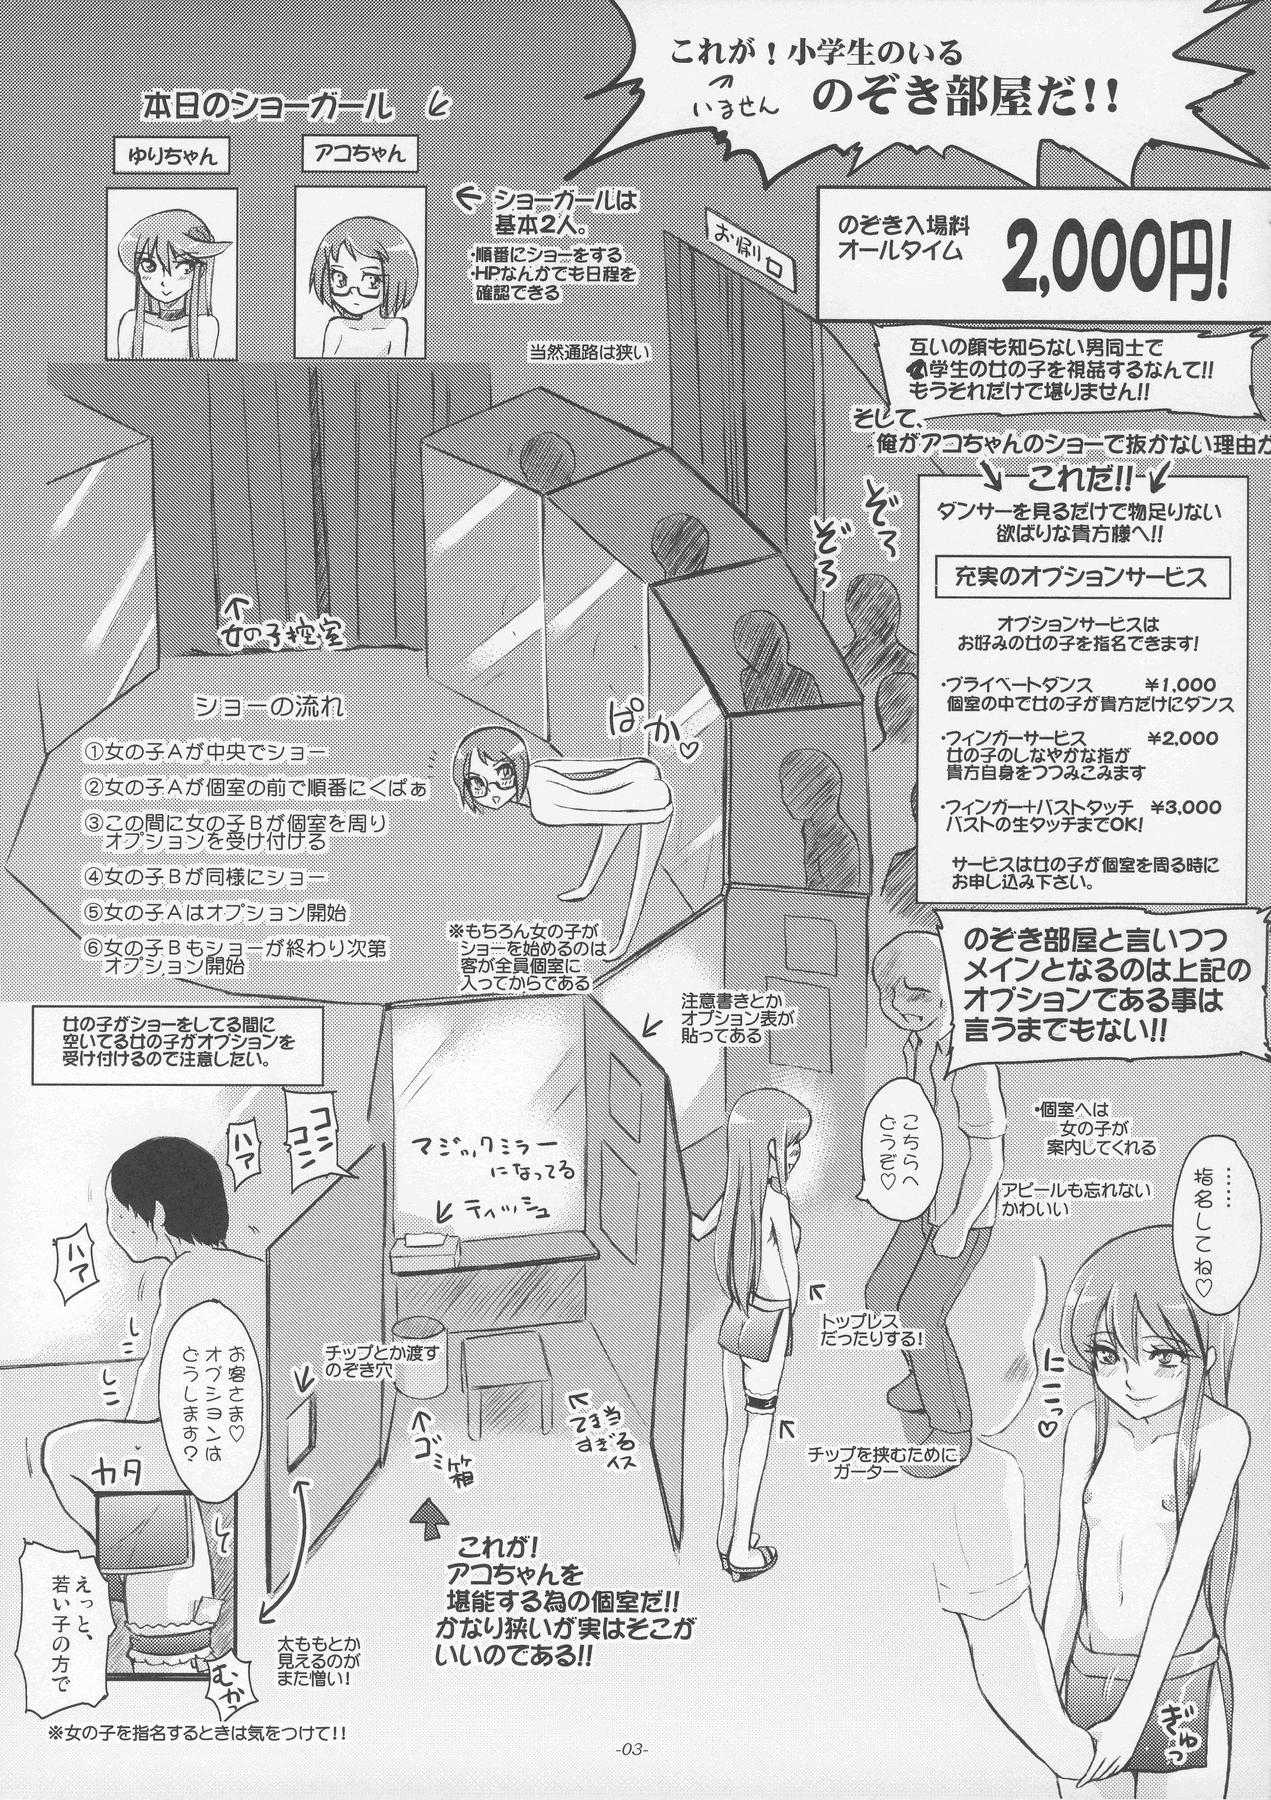 Kocchi wo Muiteyo, Ako-chan! 3